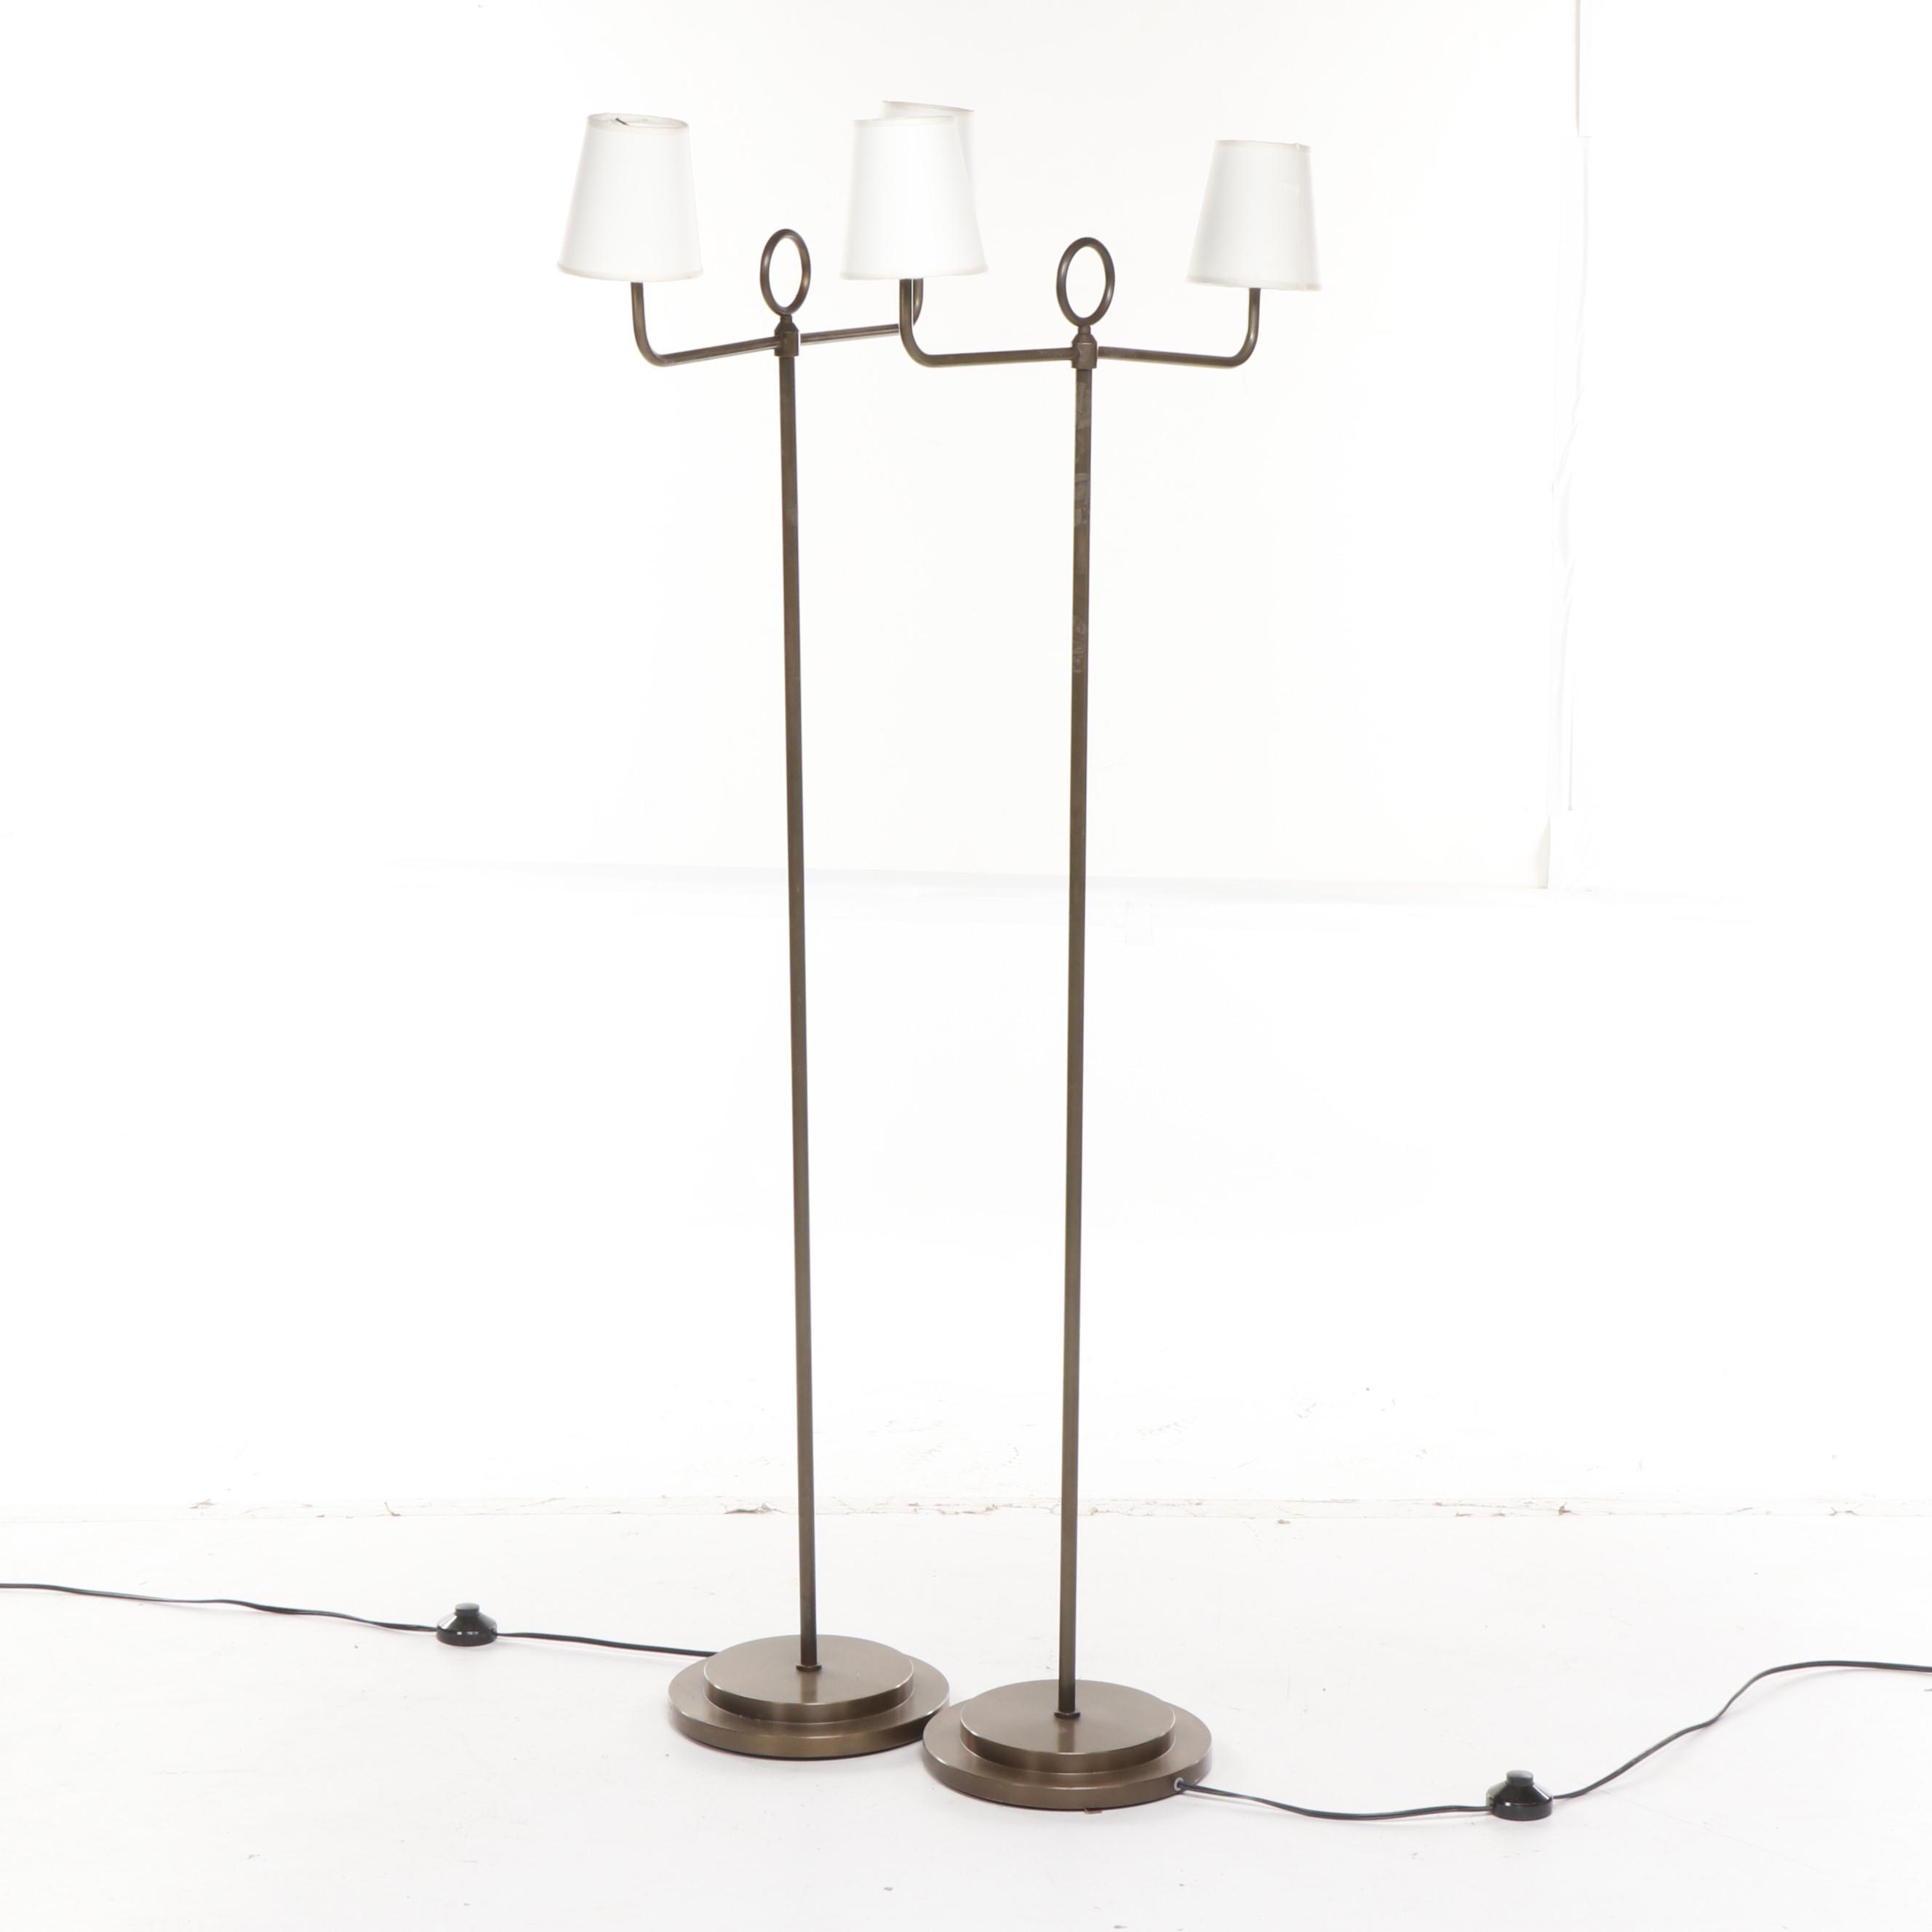 Italian Metal Double Arm Floor Lamps, Contemporary